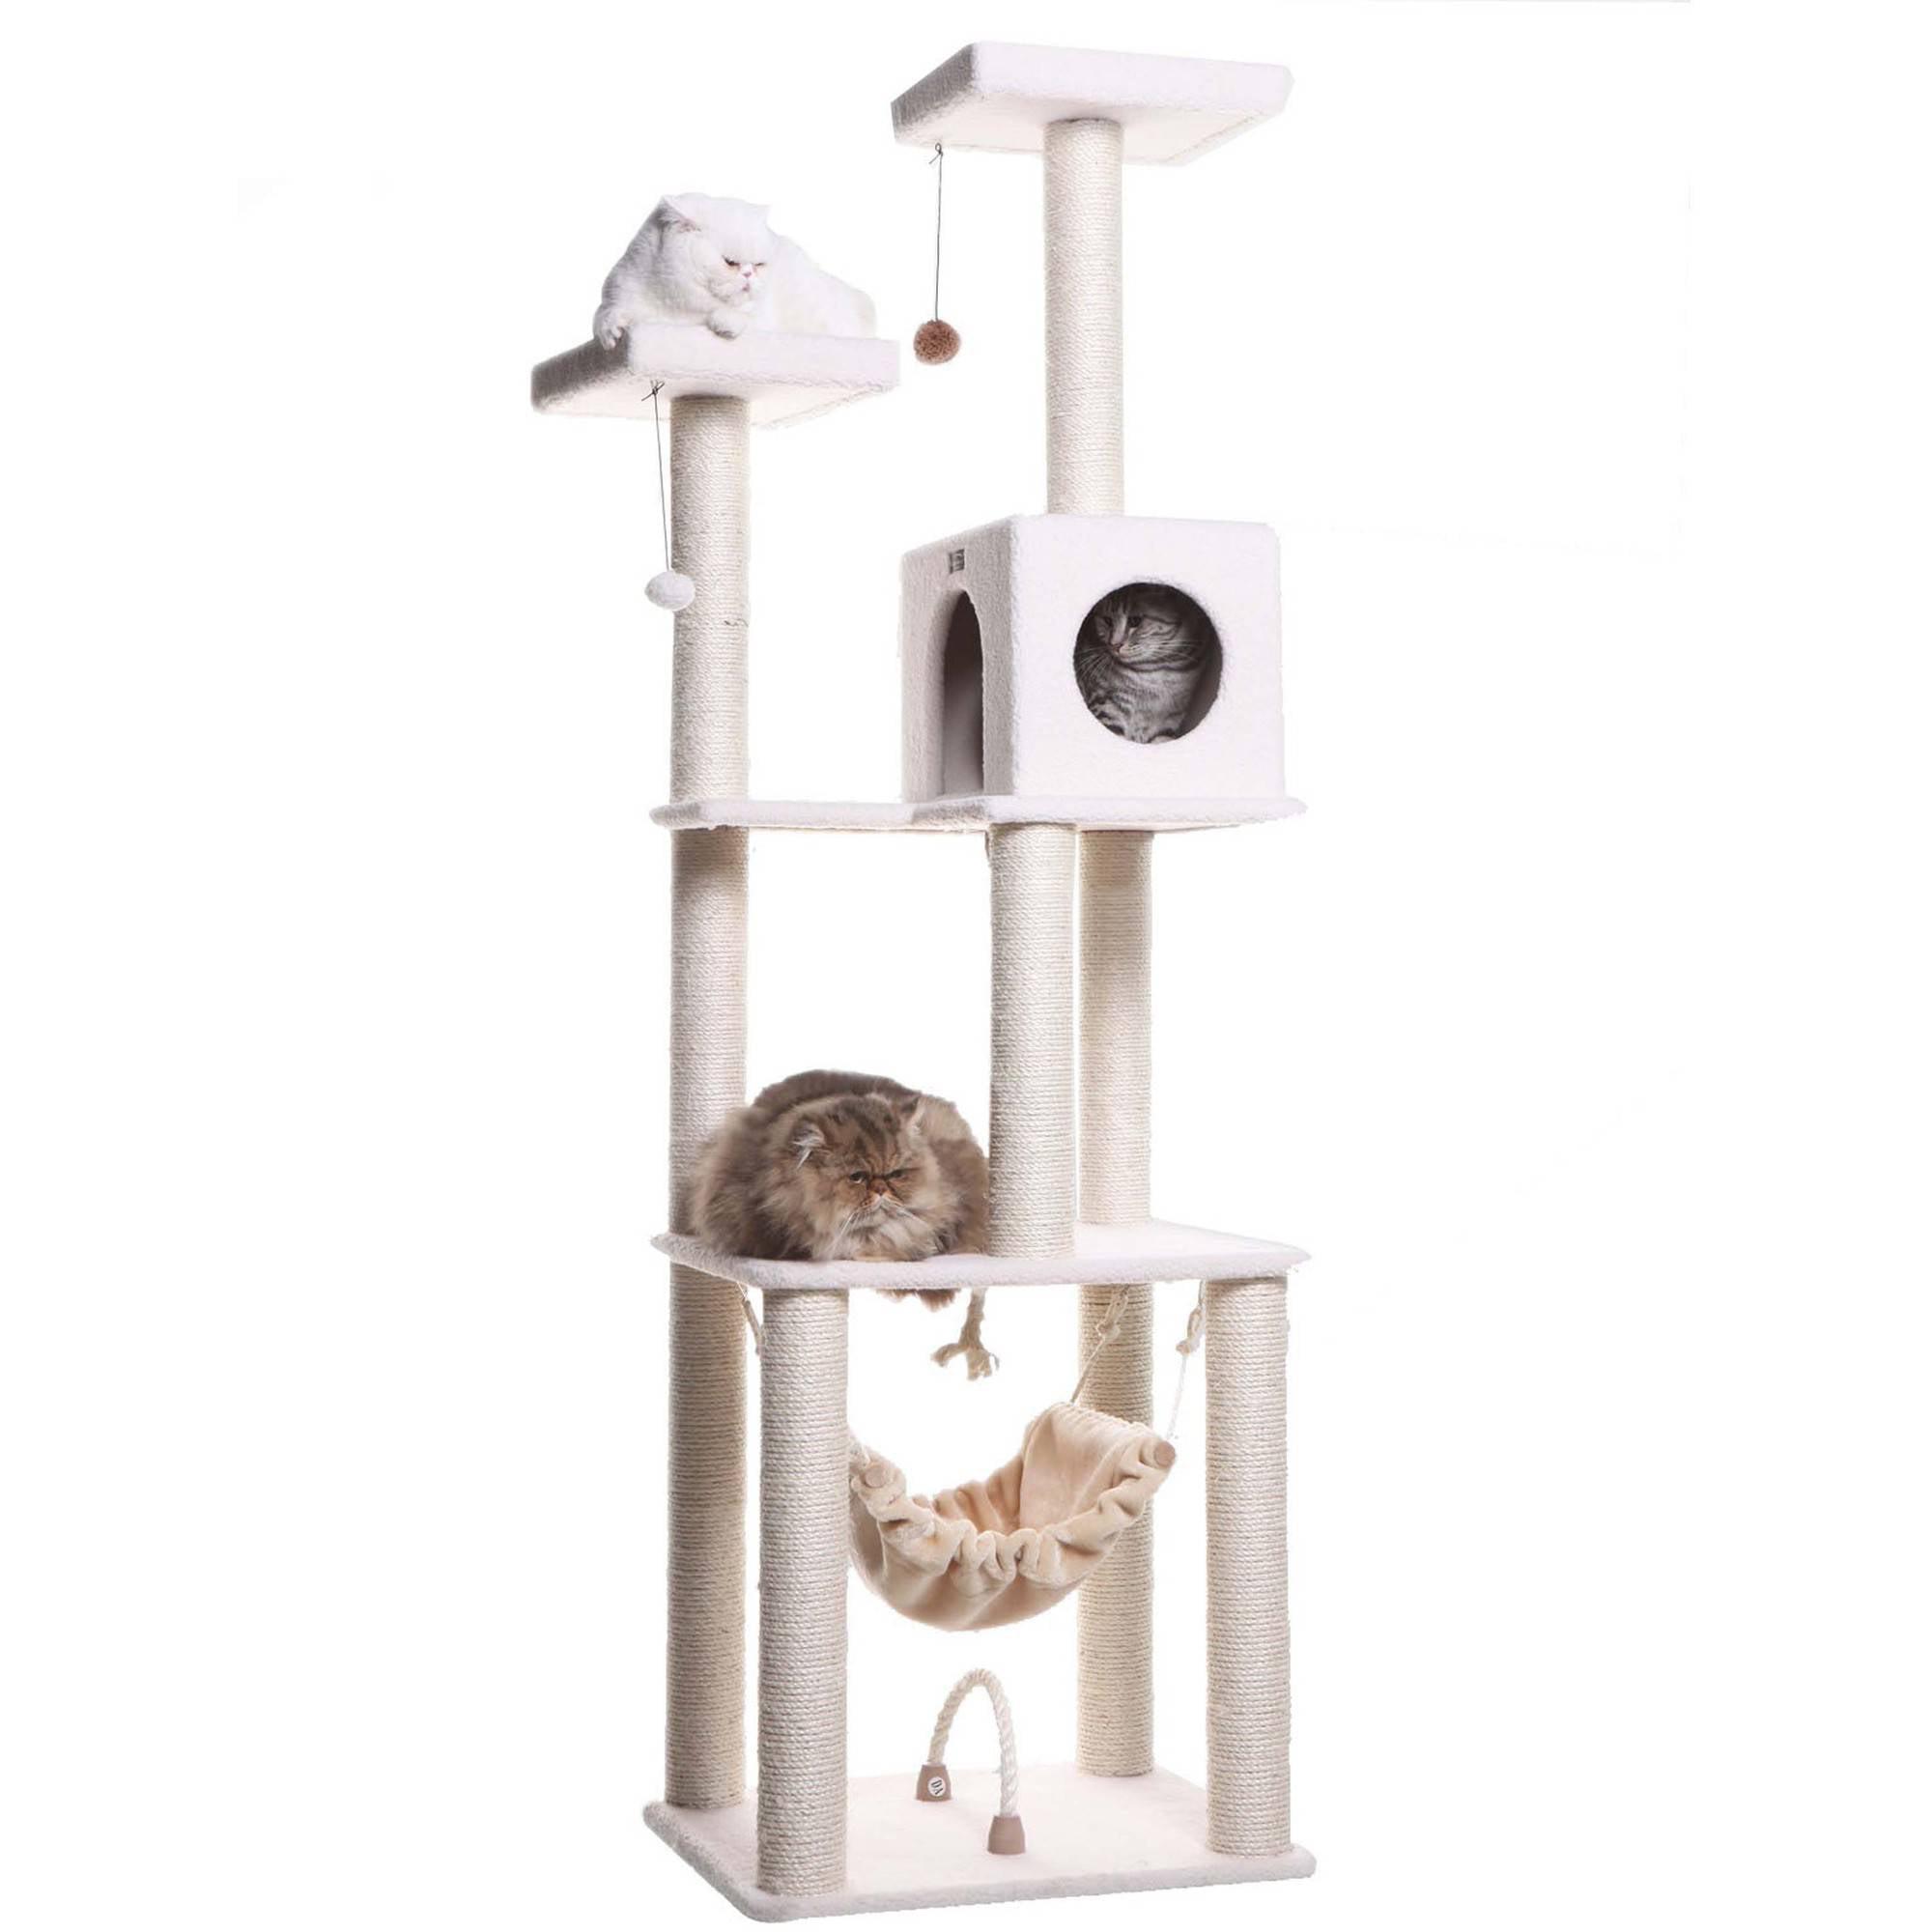 Armarkat Classic Deluxe Cat Tree, Model B7301, Ivory by Aeromark Intl Inc